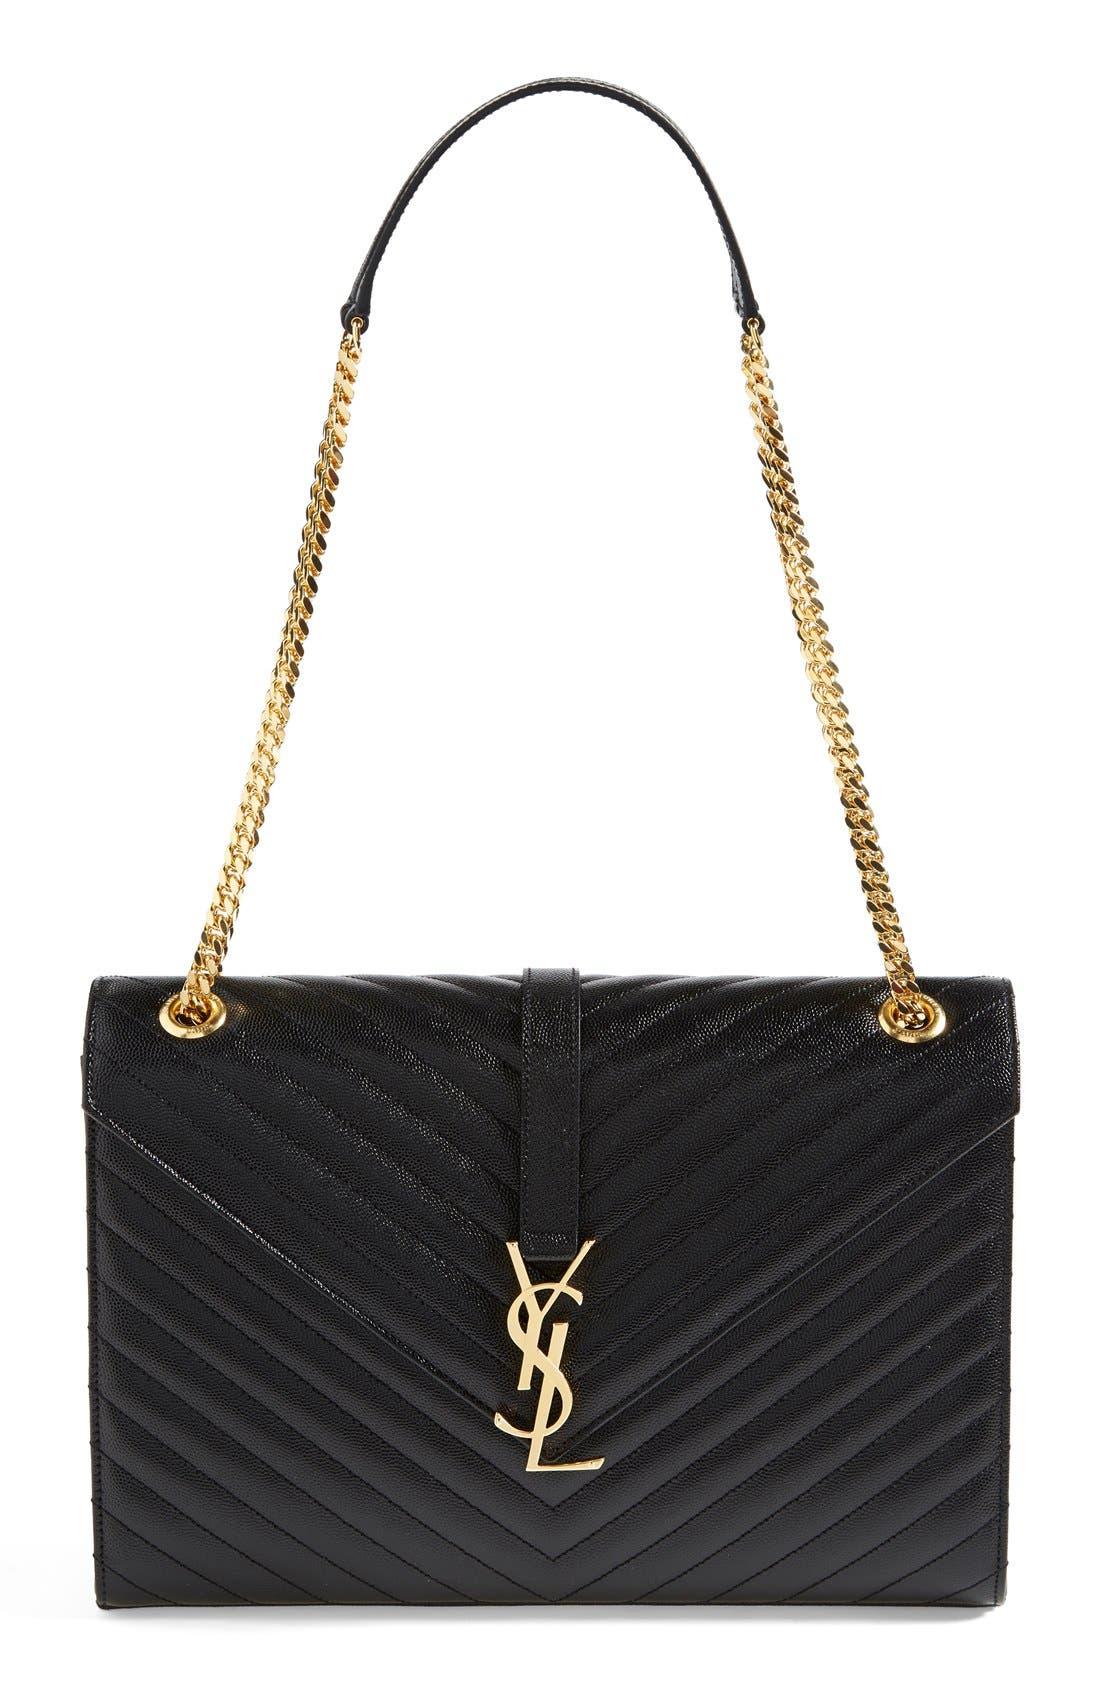 Main Image - Saint Laurent 'Monogram' Leather Shoulder Bag